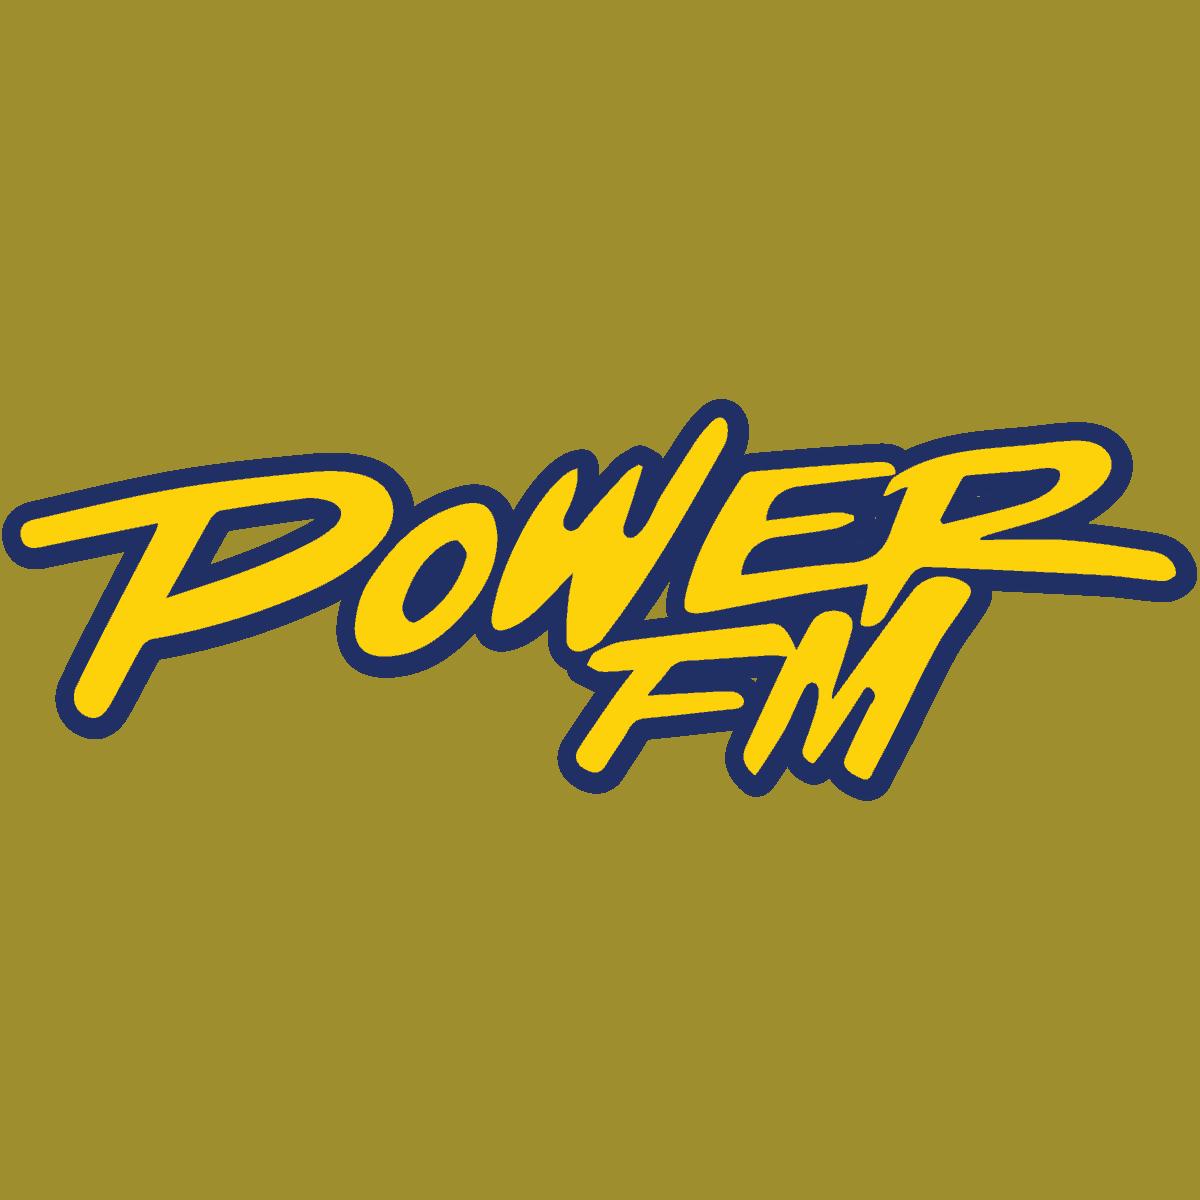 https://specialstrong.com/wp-content/uploads/2019/09/MUR_POWER_FM_2265531_config_station_logo_image_1543892395.png